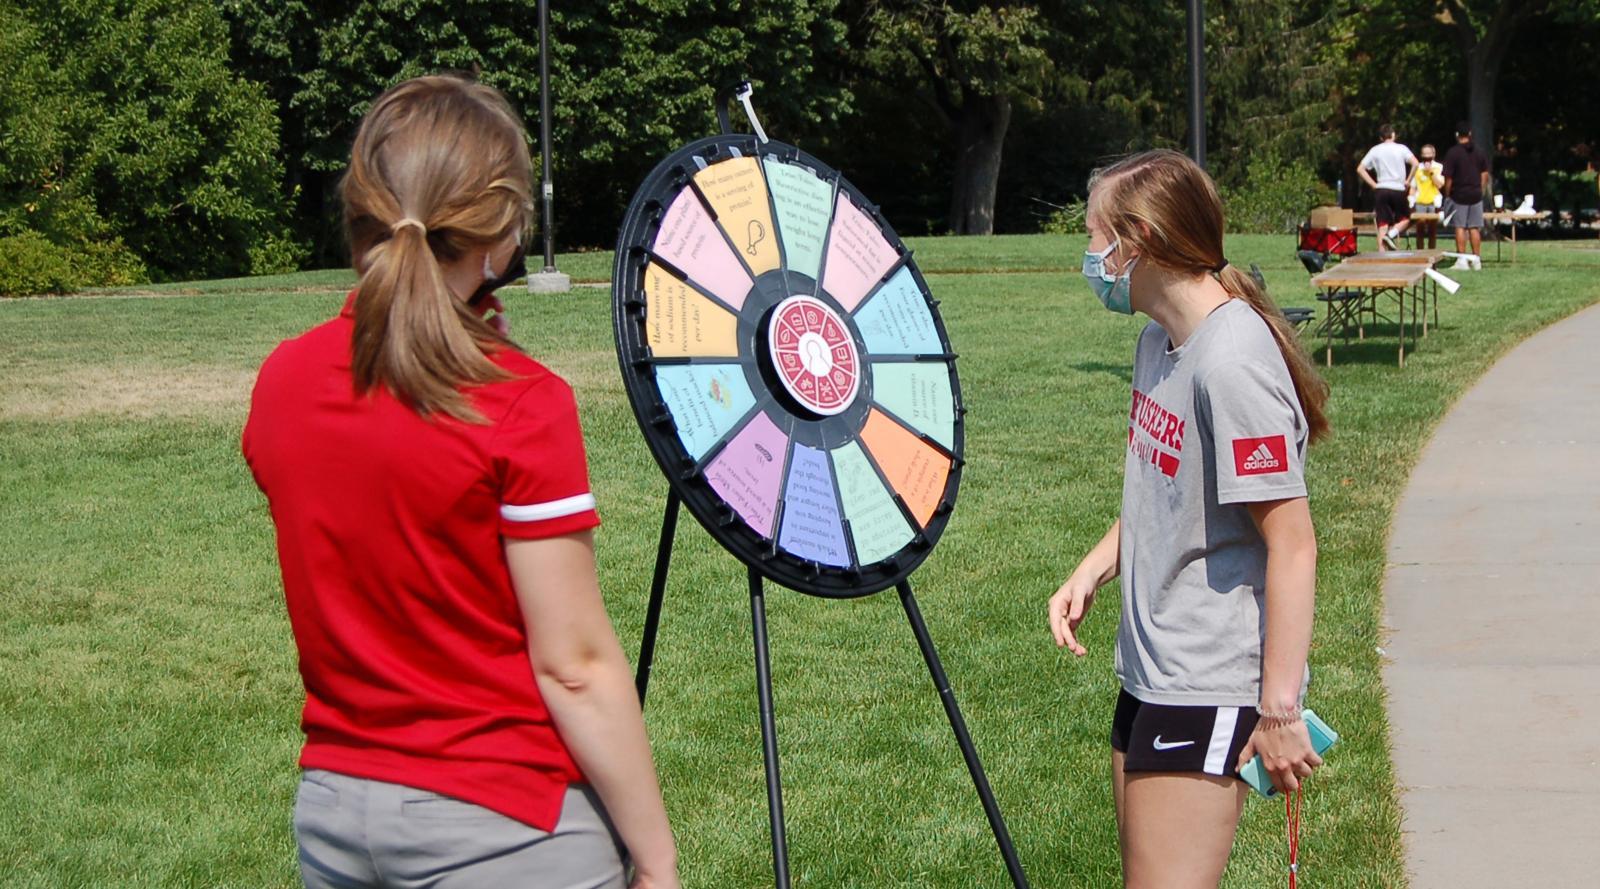 Spinning wheel at Wellness Fest